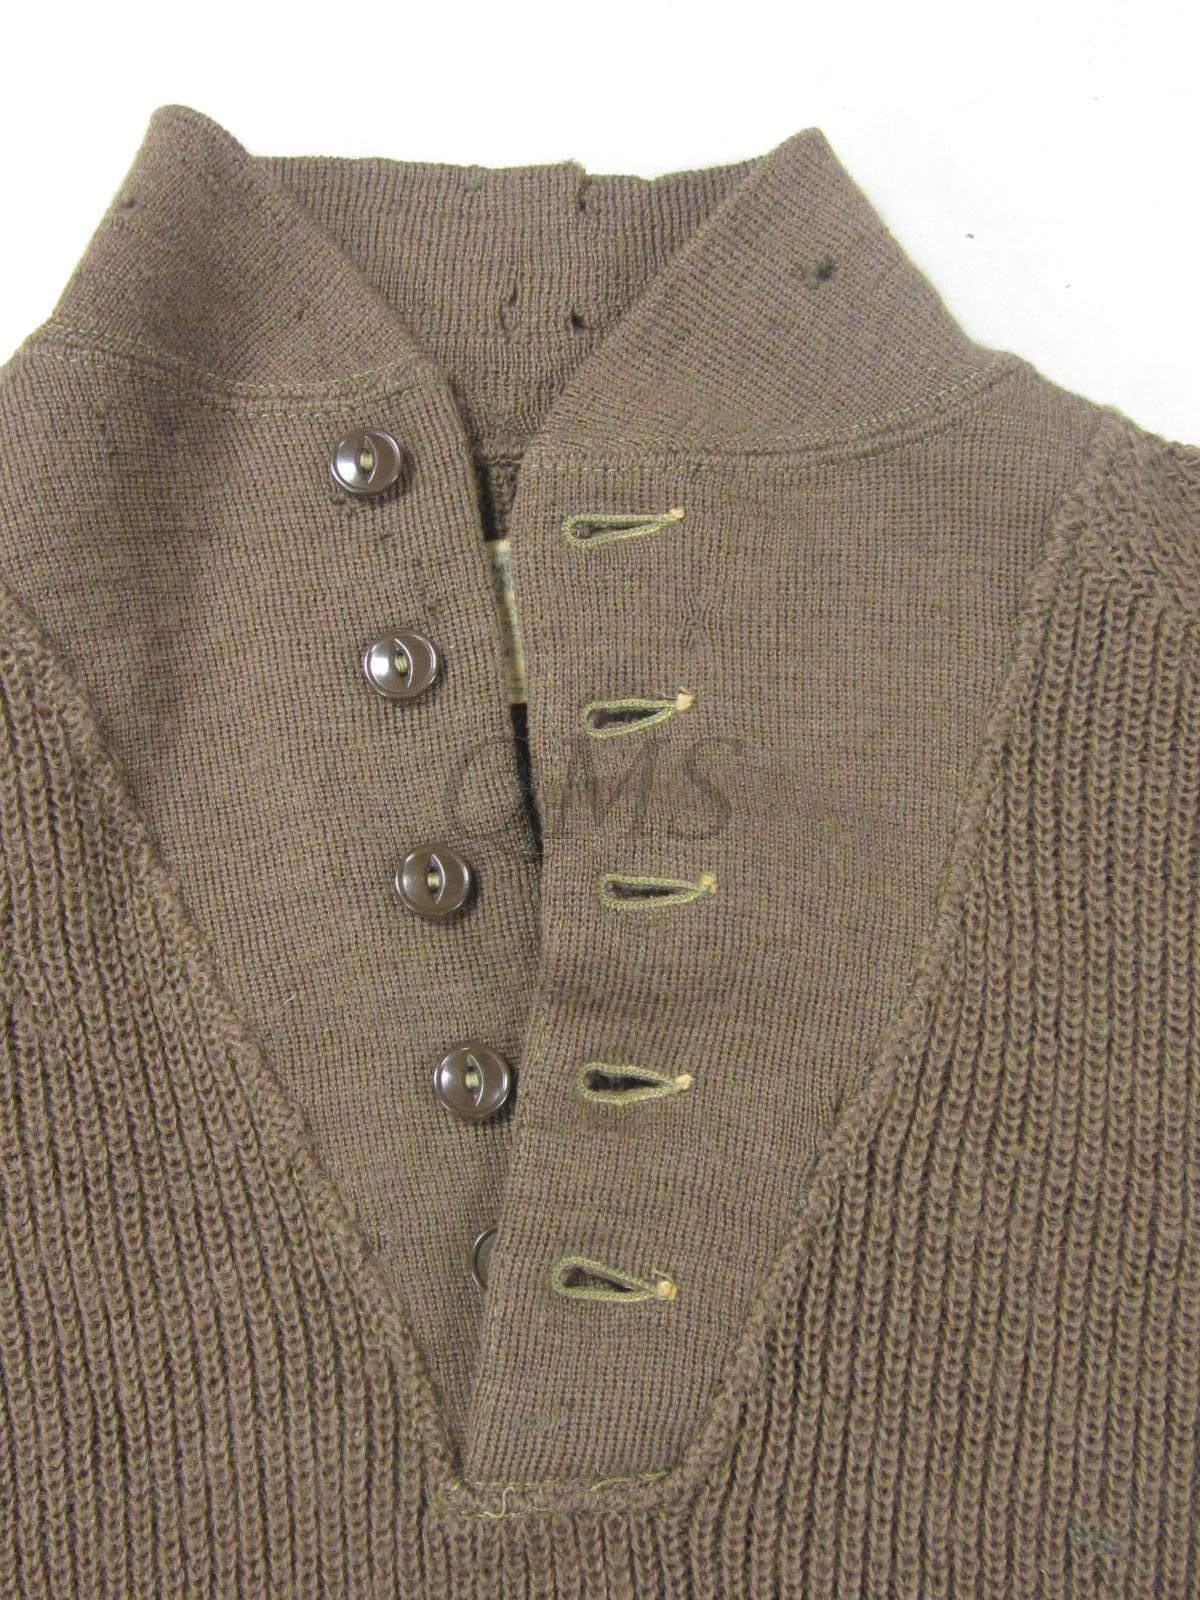 Ww2 U S Army Men S High Neck Sweater 5 Button